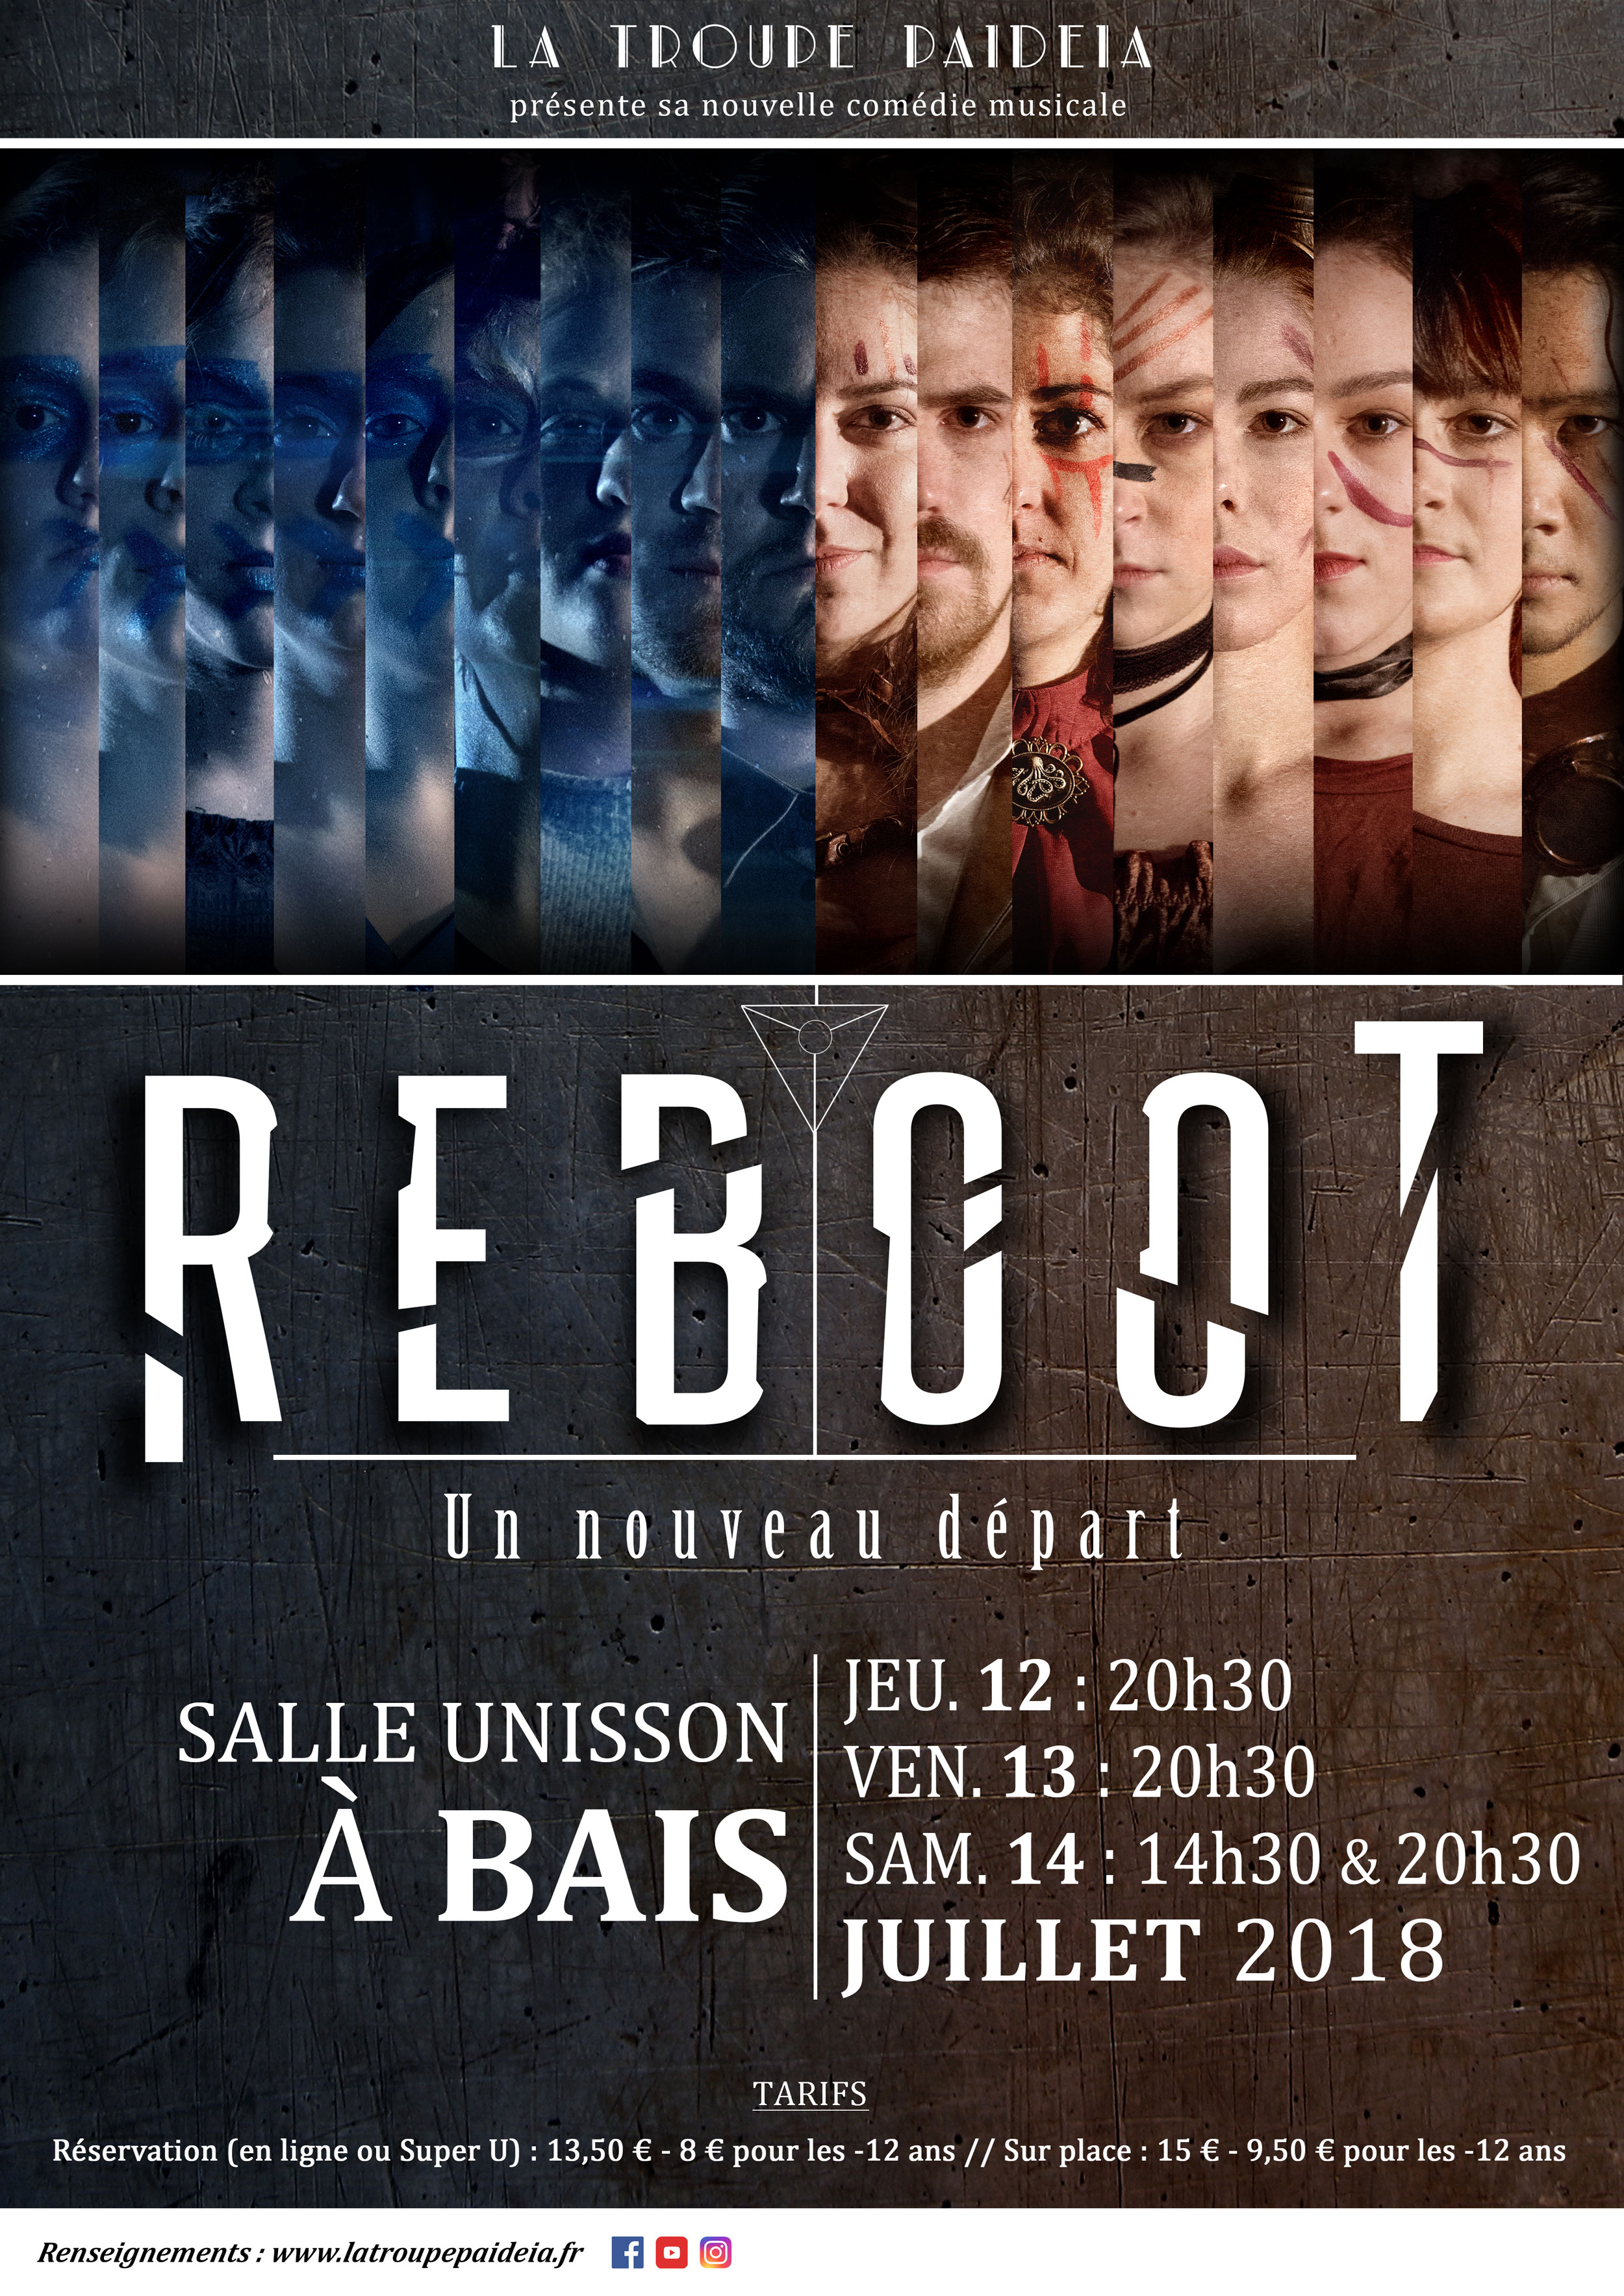 Reboot, affiche comédie musicale rennes